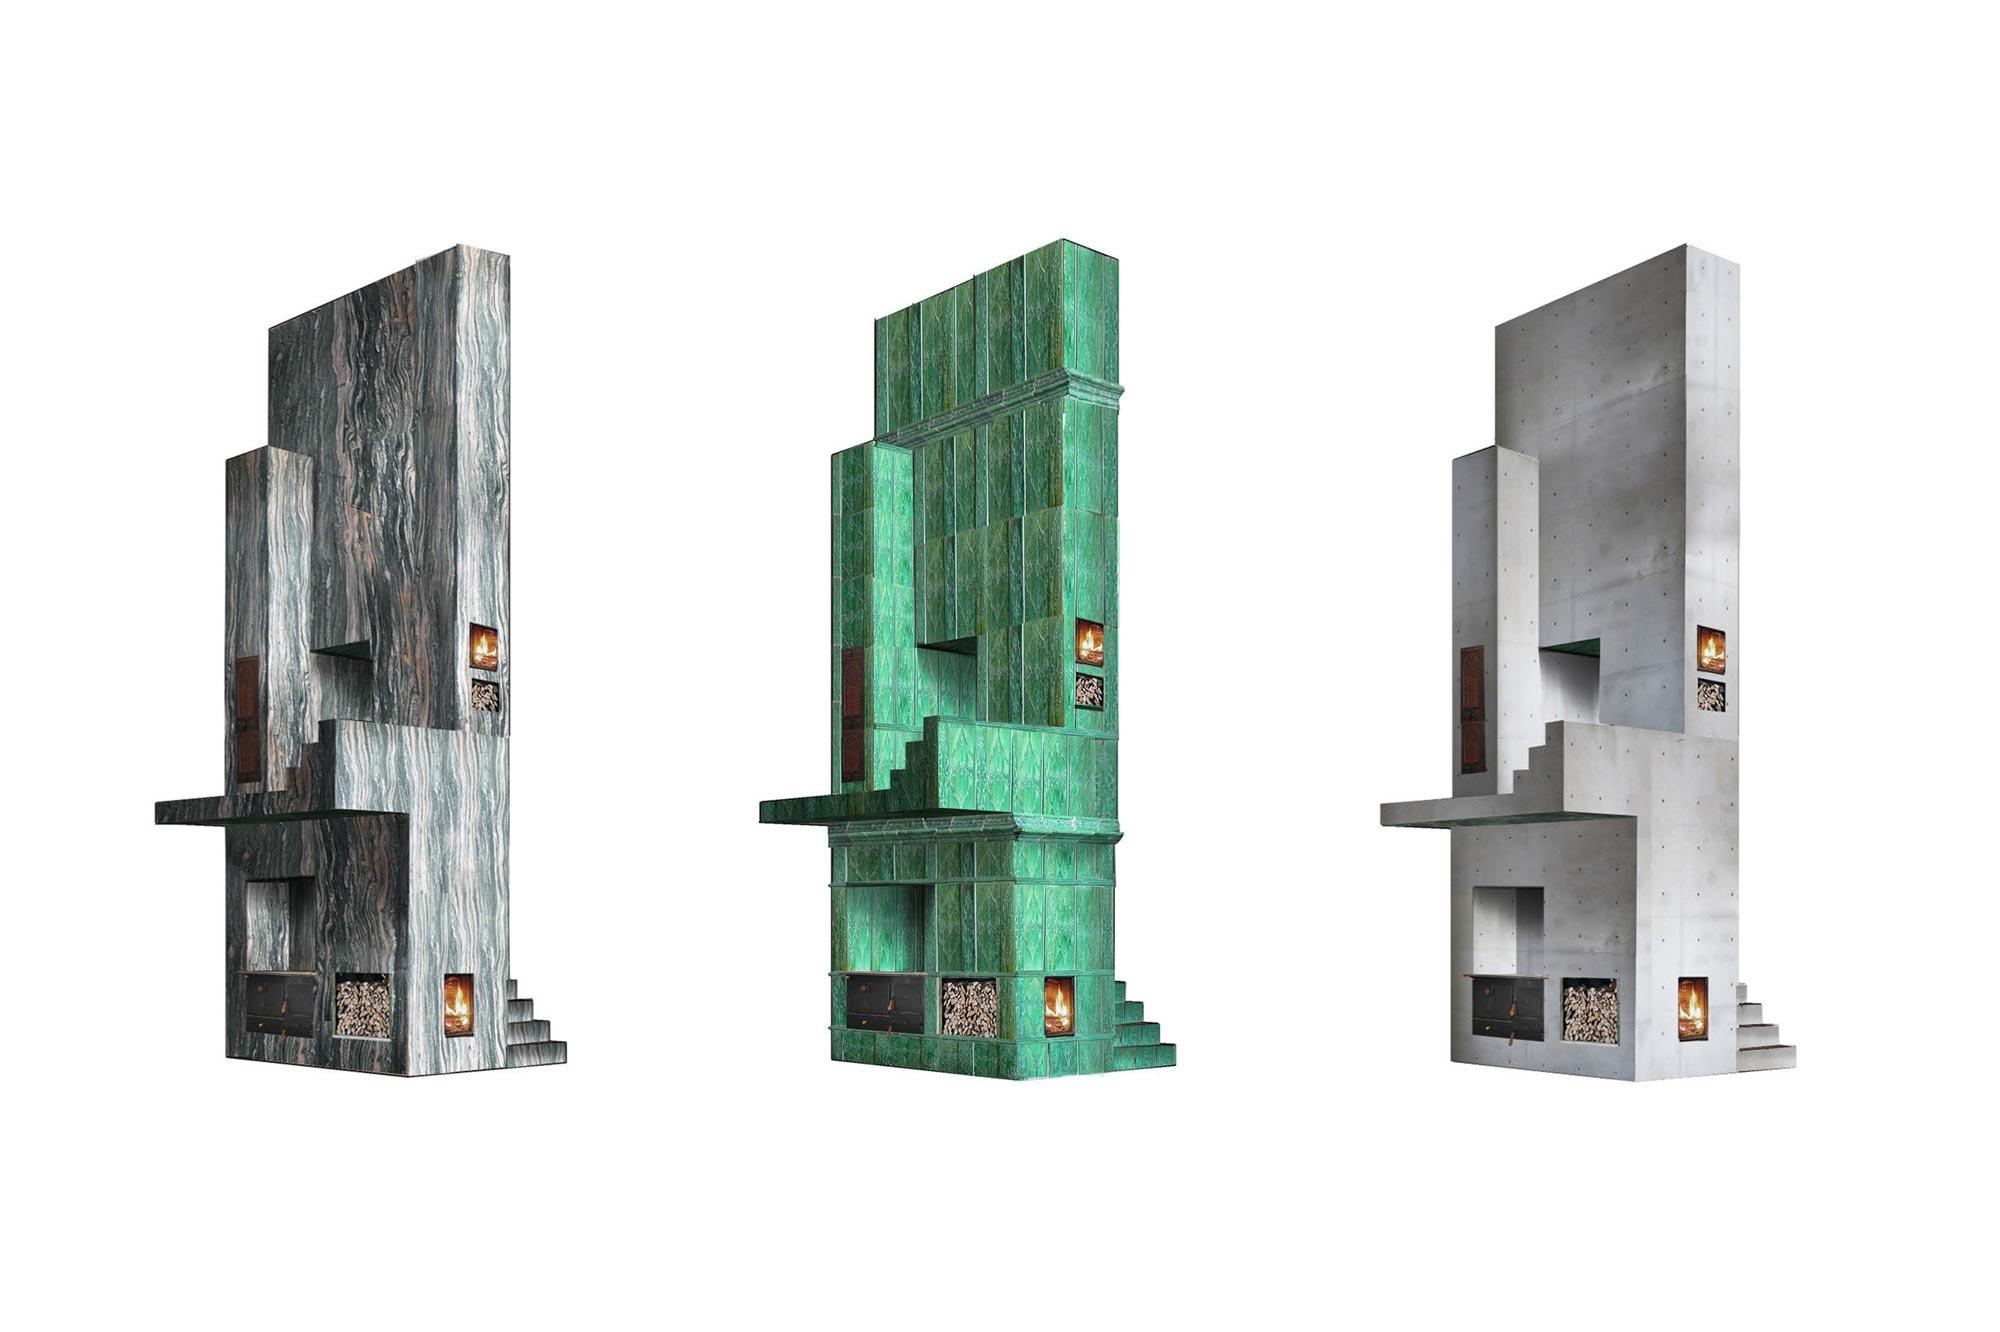 cube-haus-skene-catling-architects-cs-2000×1332-06